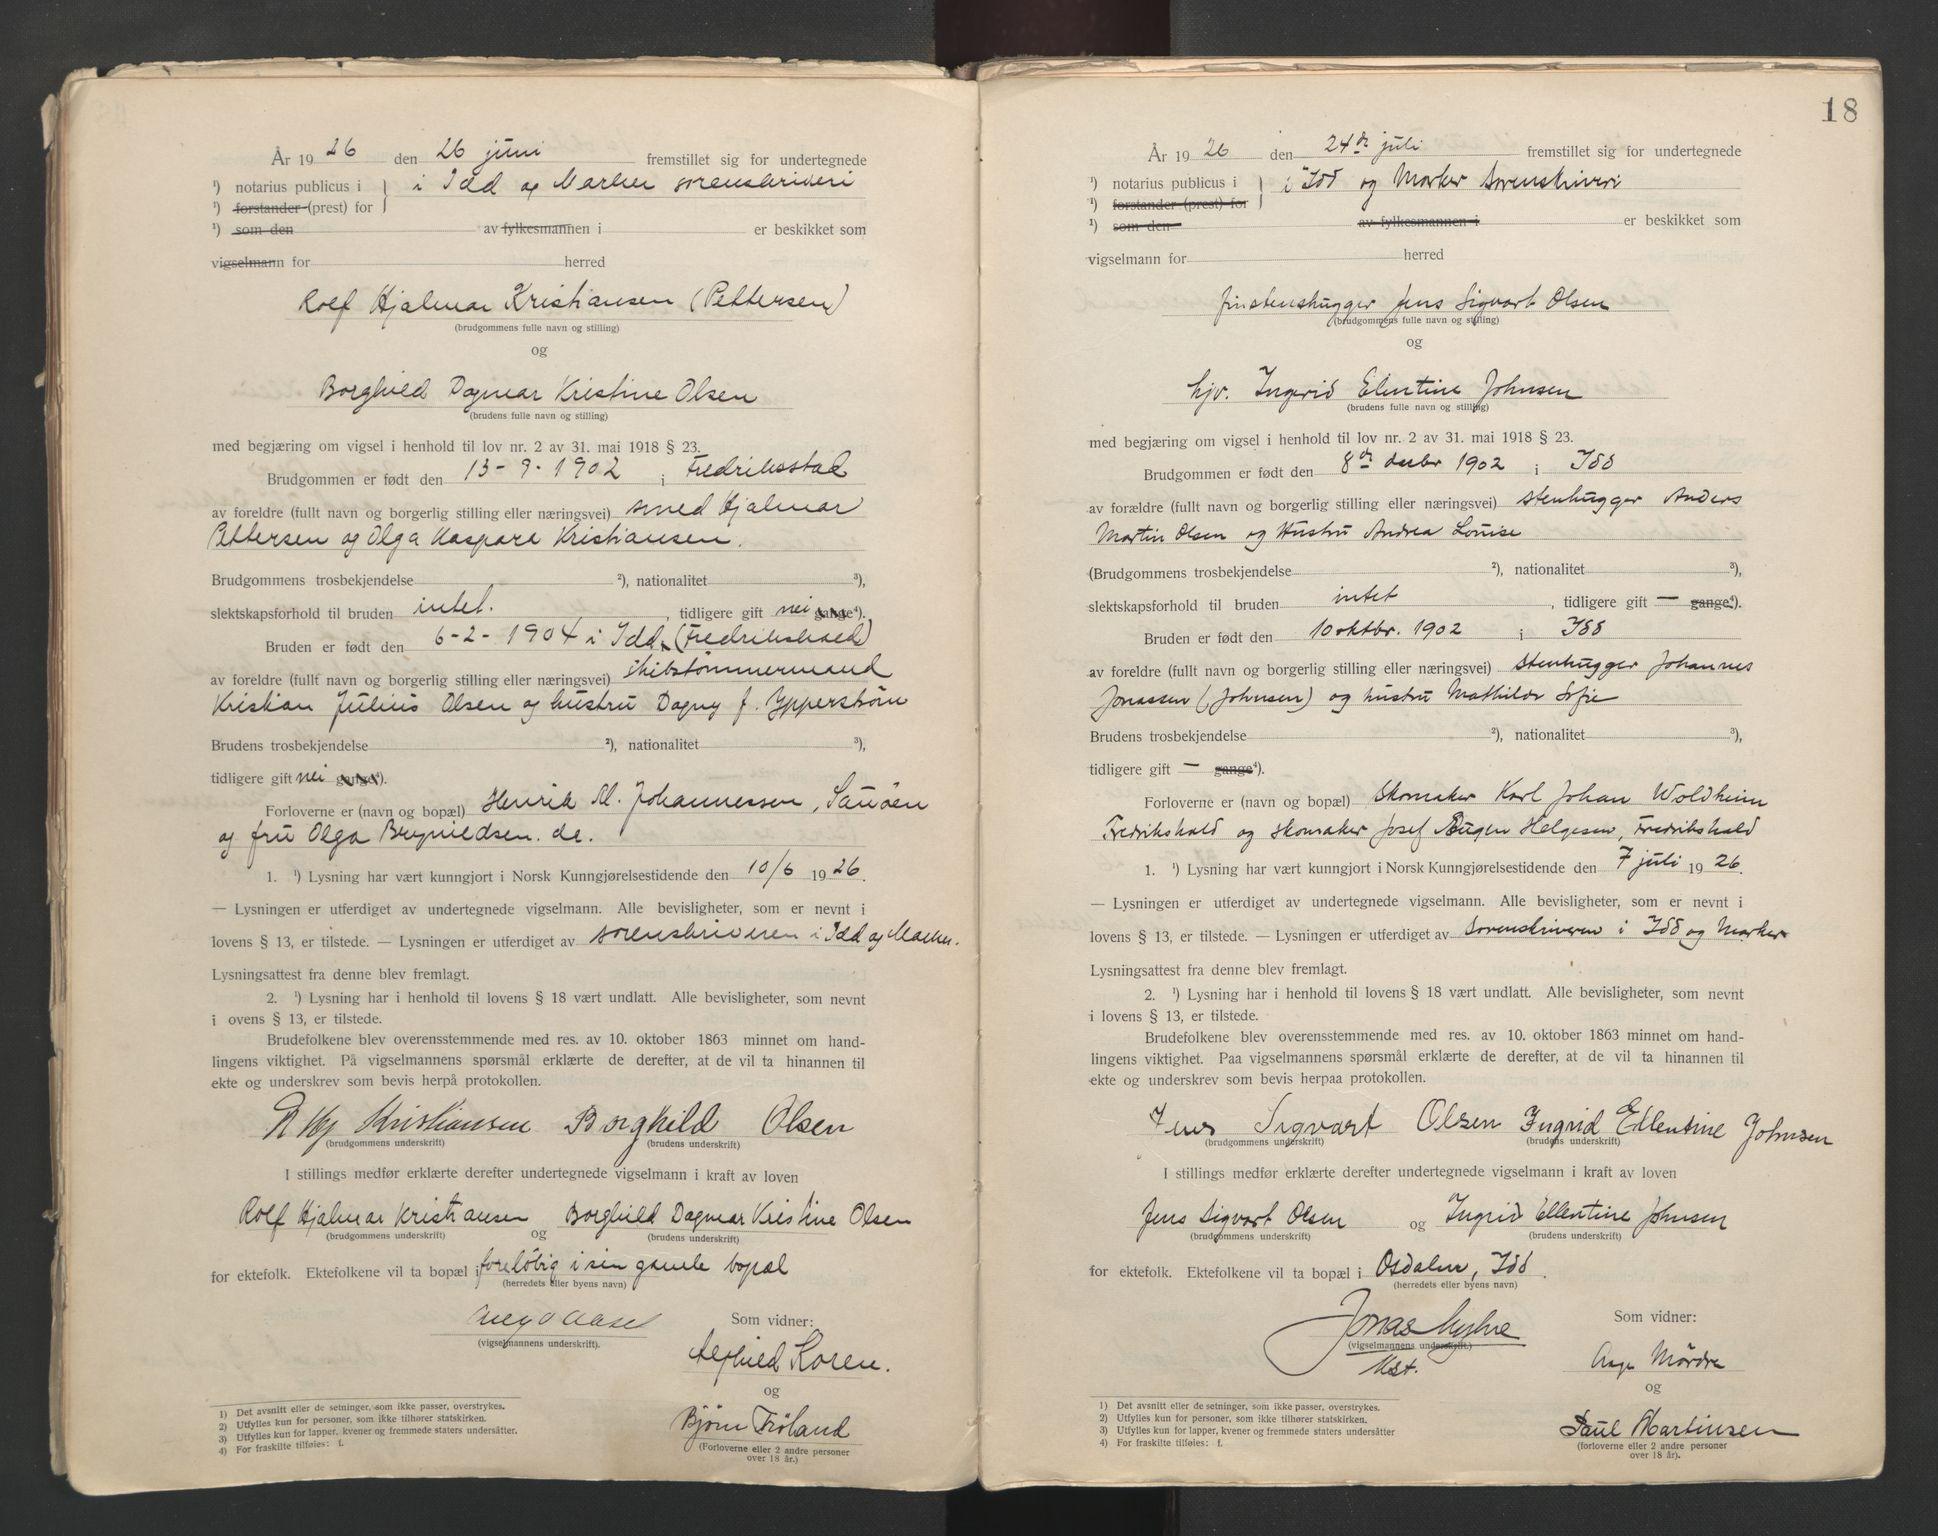 SAO, Idd og Marker sorenskriveri, L/Lc/L0001: Vigselsbøker, 1920-1942, s. 18